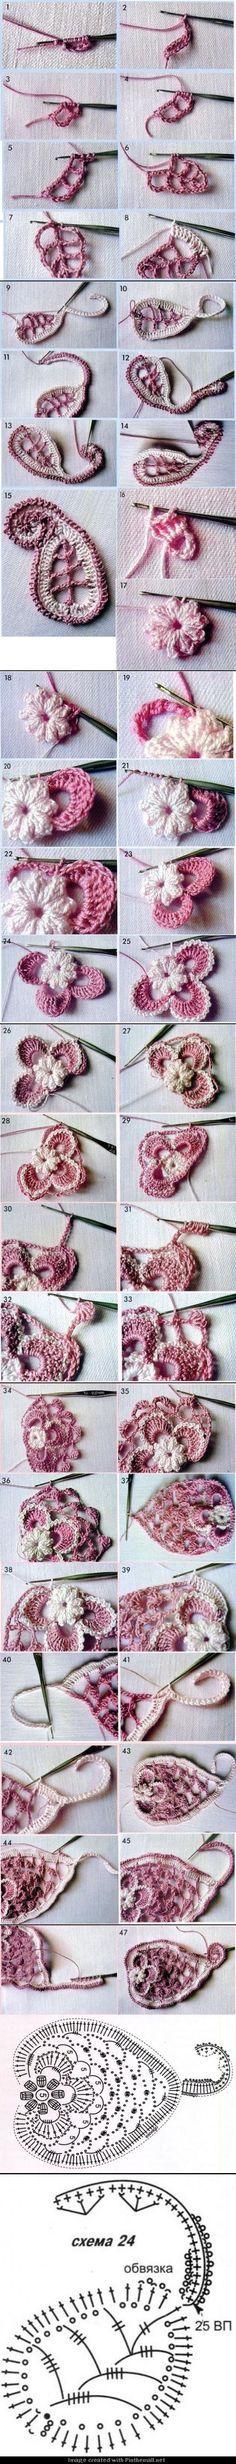 divine irish crochet lace; - created via pinthemall.net - Picmia